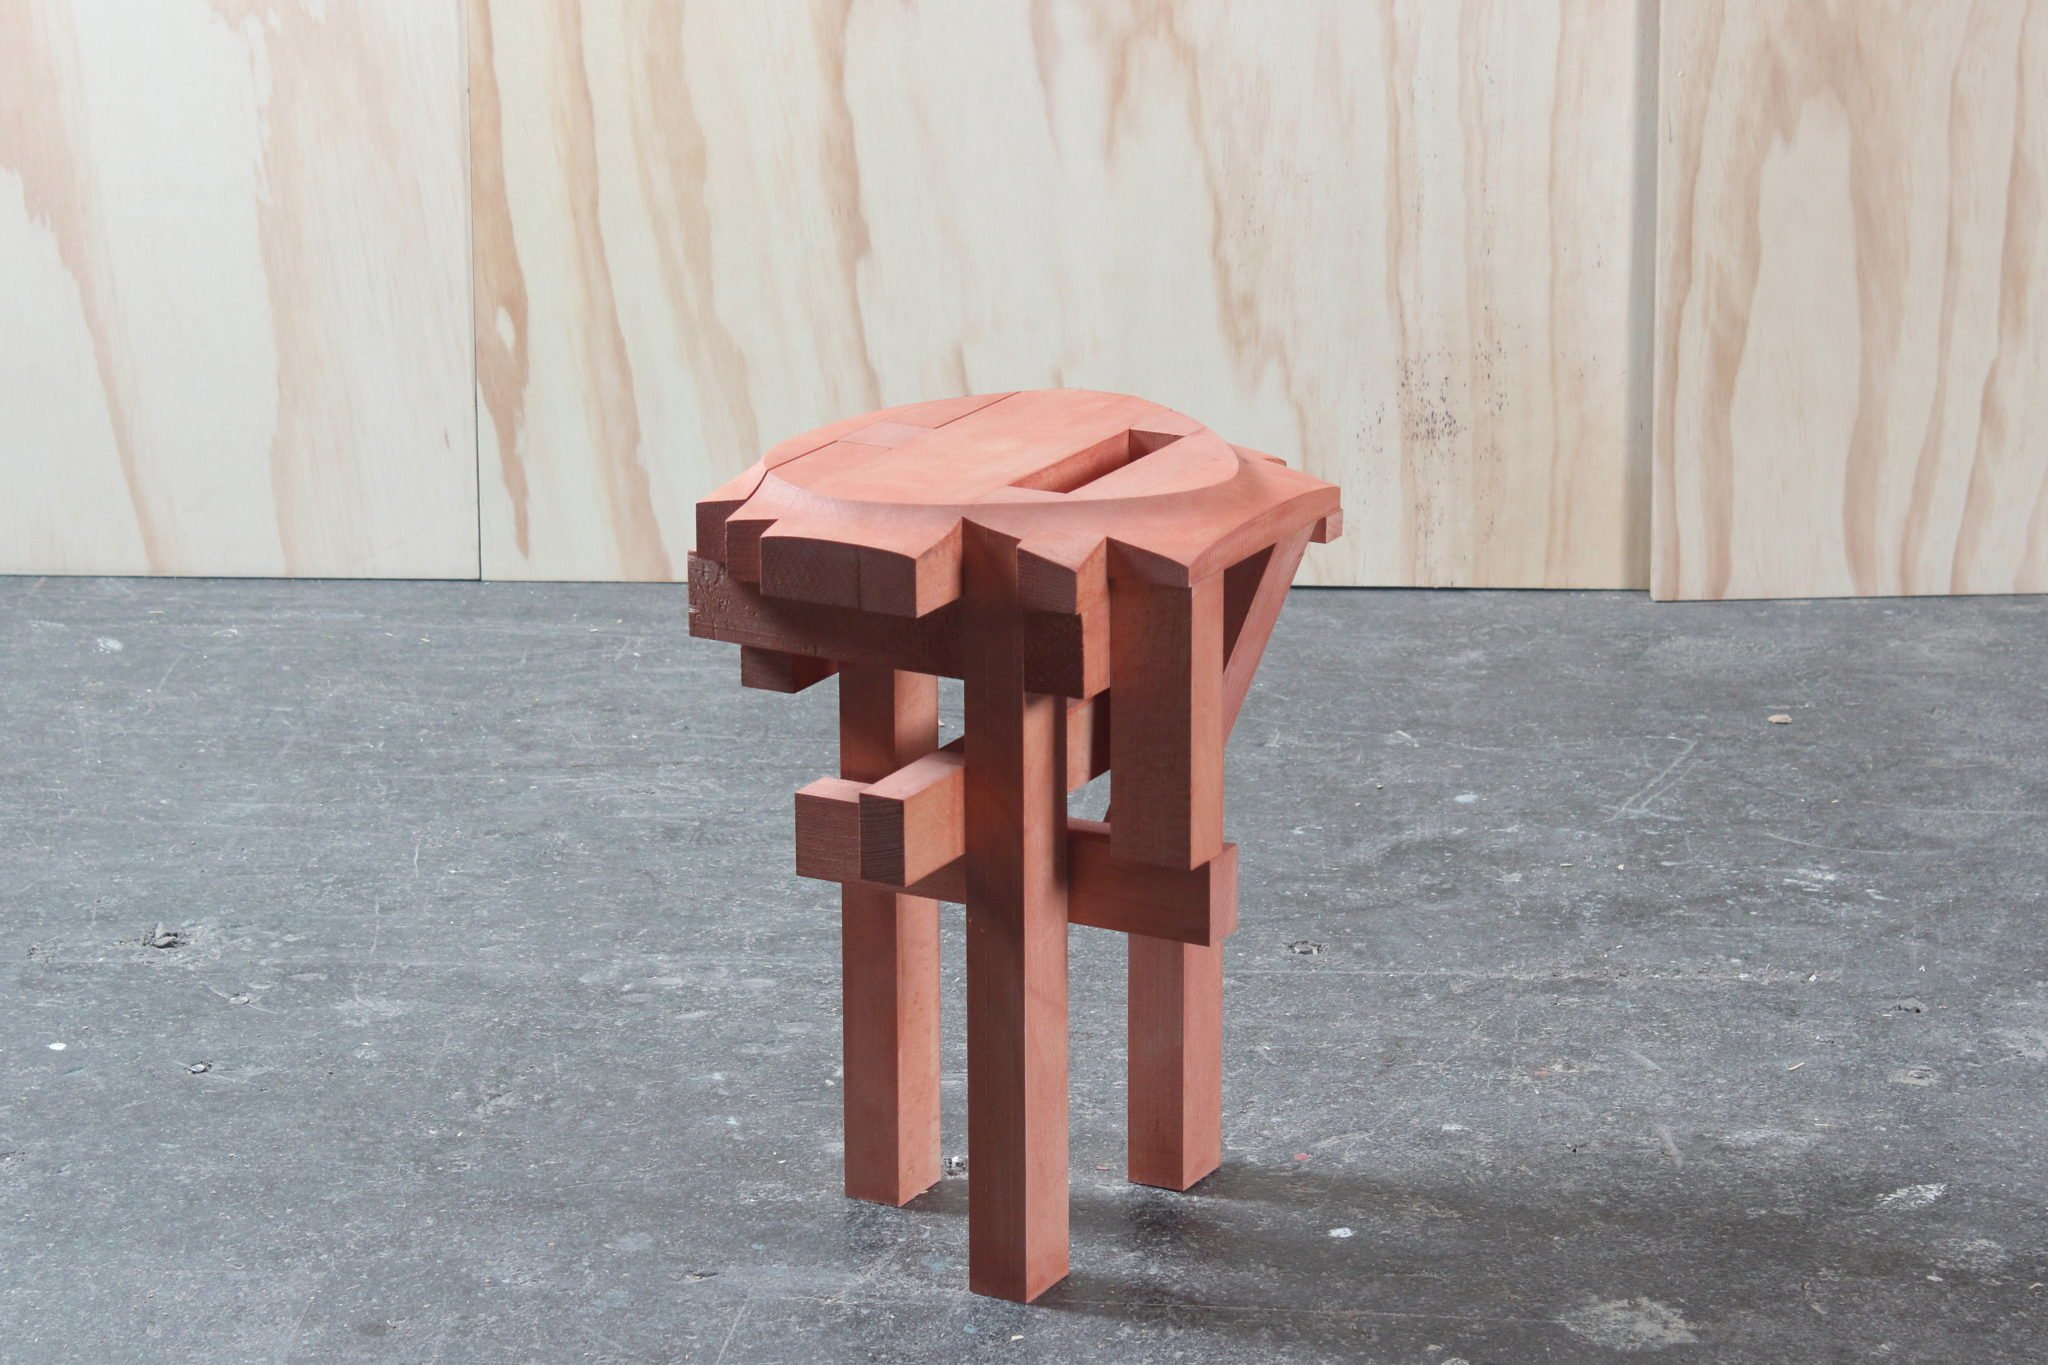 Mobilier design sculptural designer japonais Sho Ota